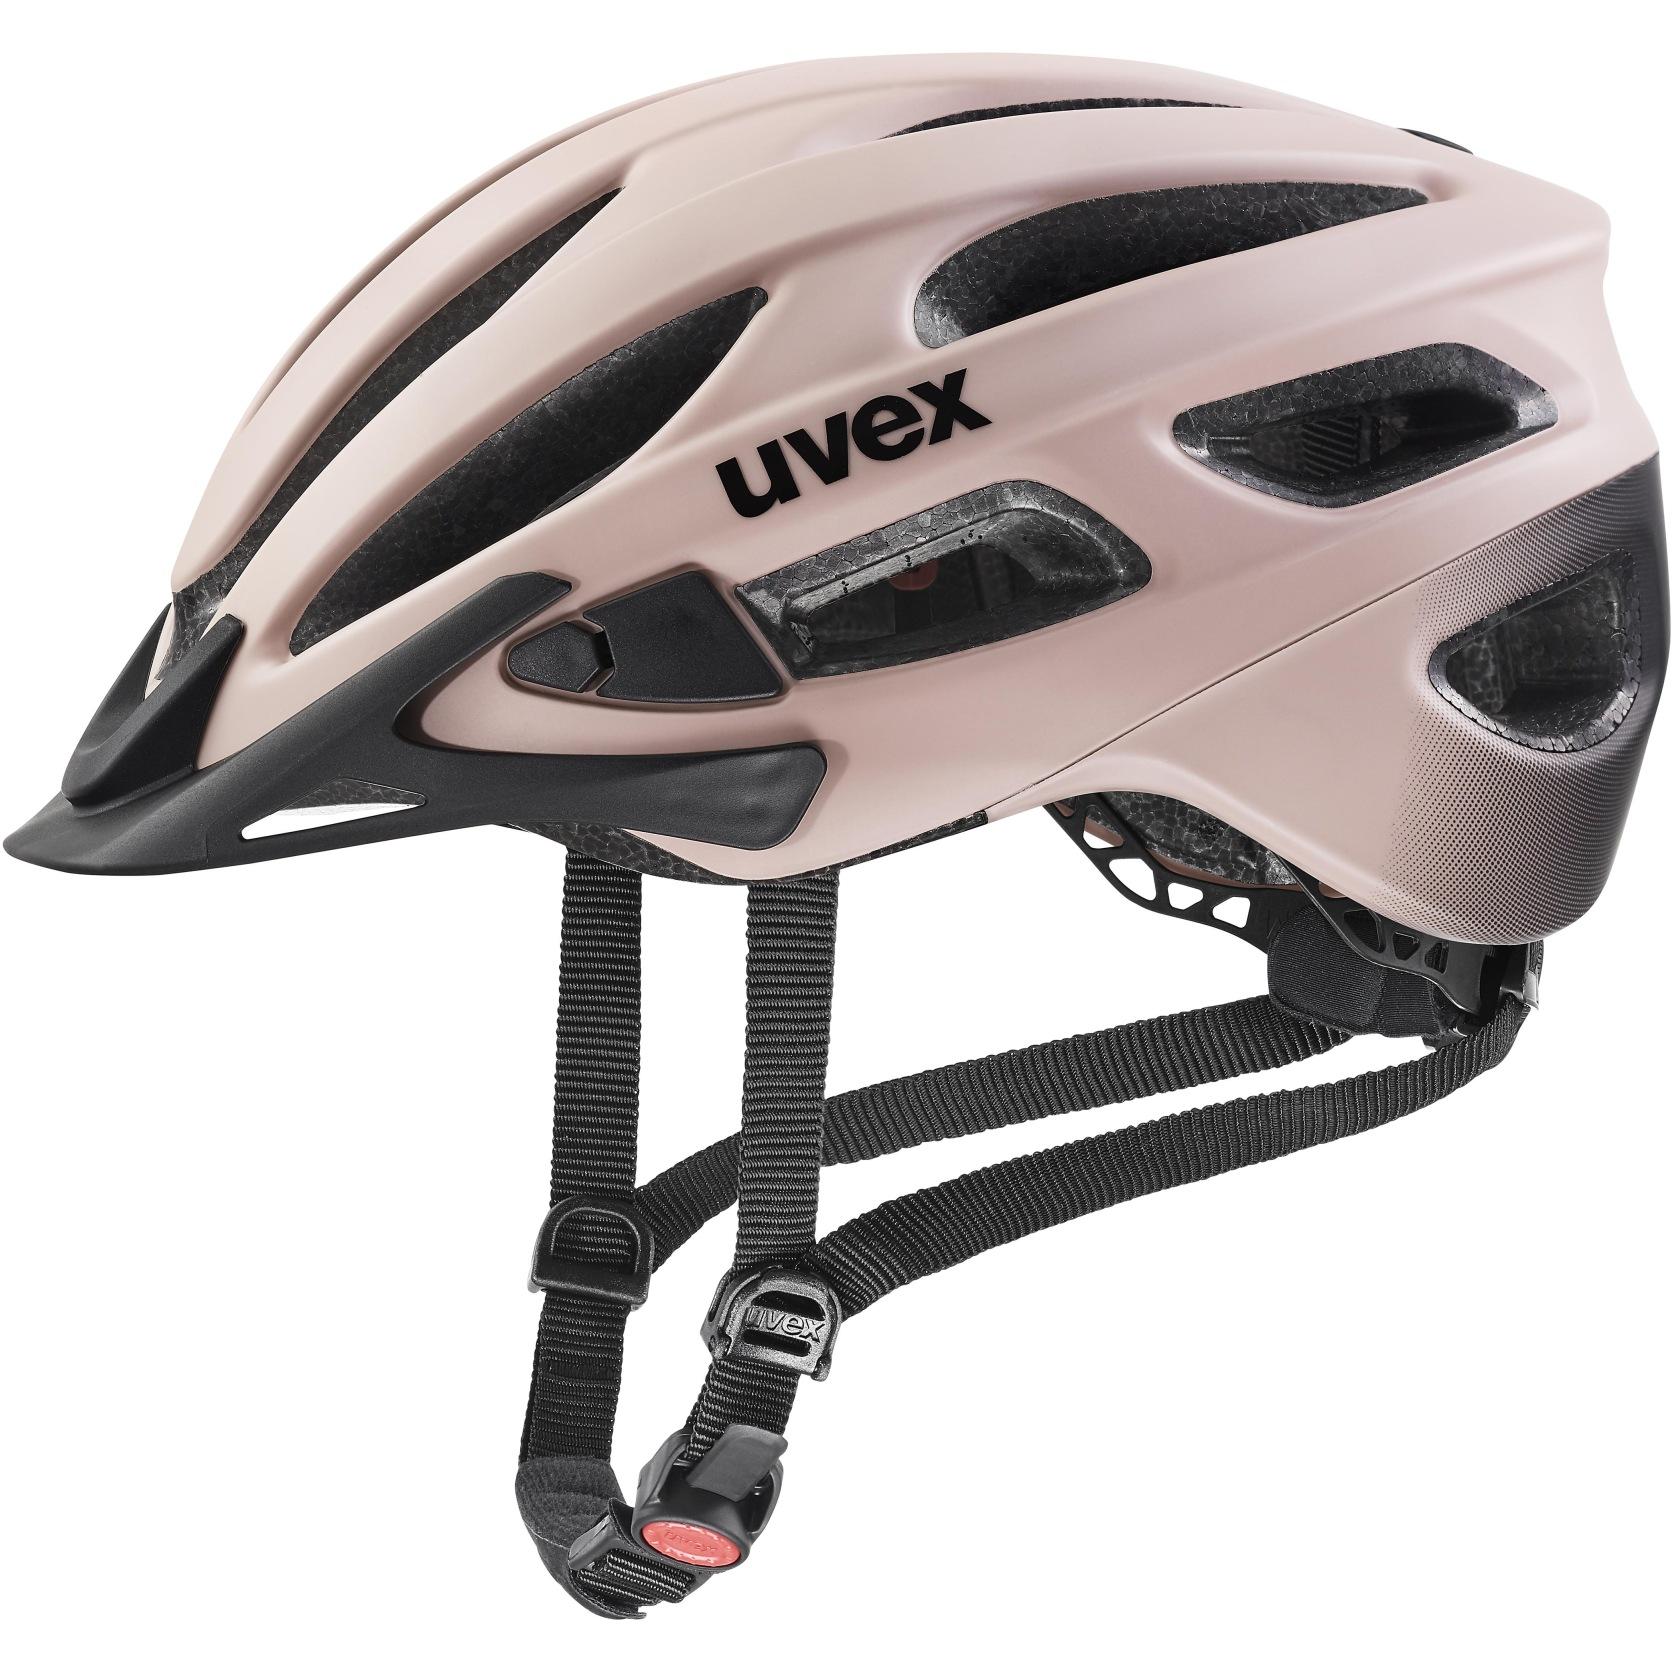 Uvex true cc Helmet - dust rose-black mat